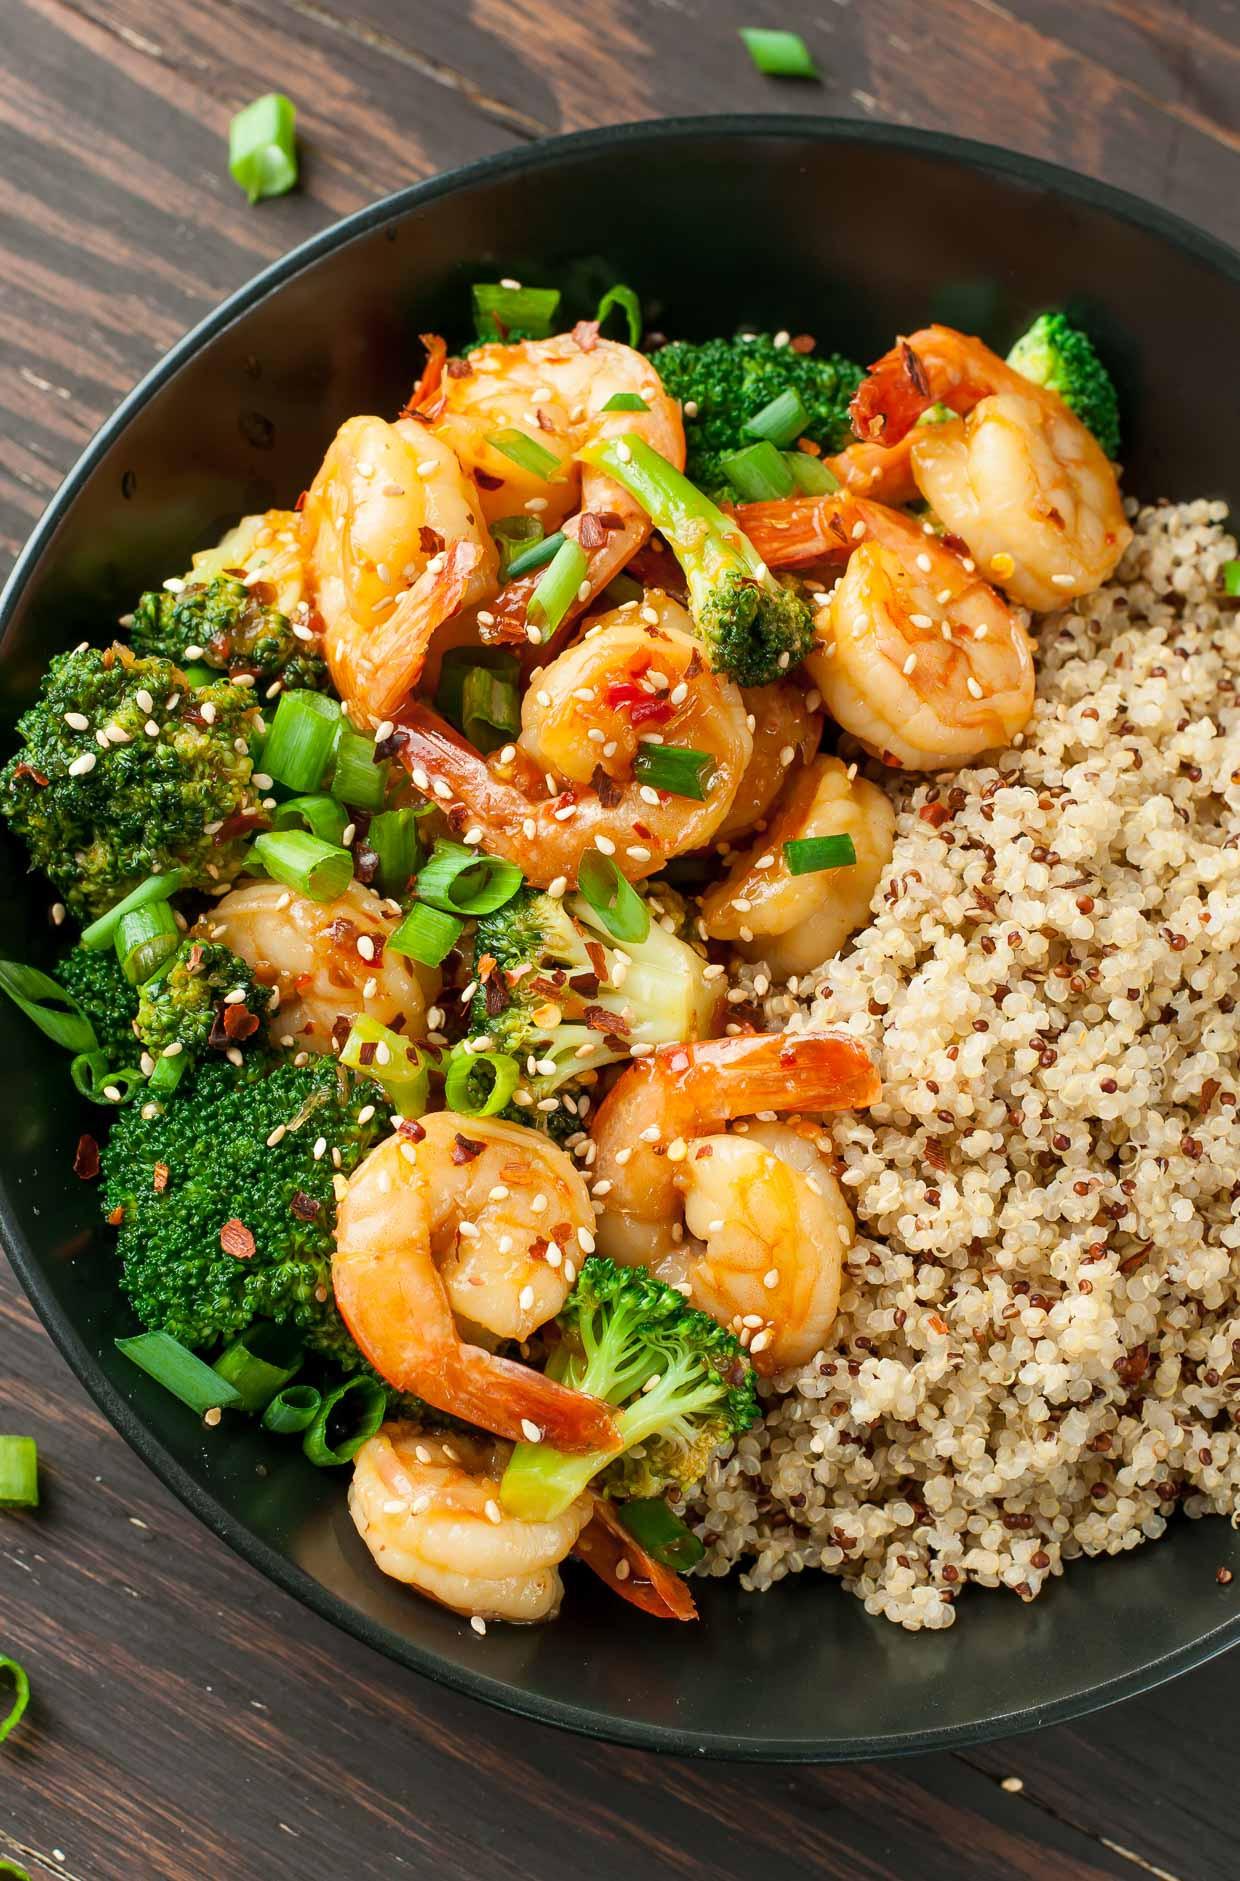 Shrimp And Broccoli  Szechuan Shrimp and Broccoli Peas And Crayons